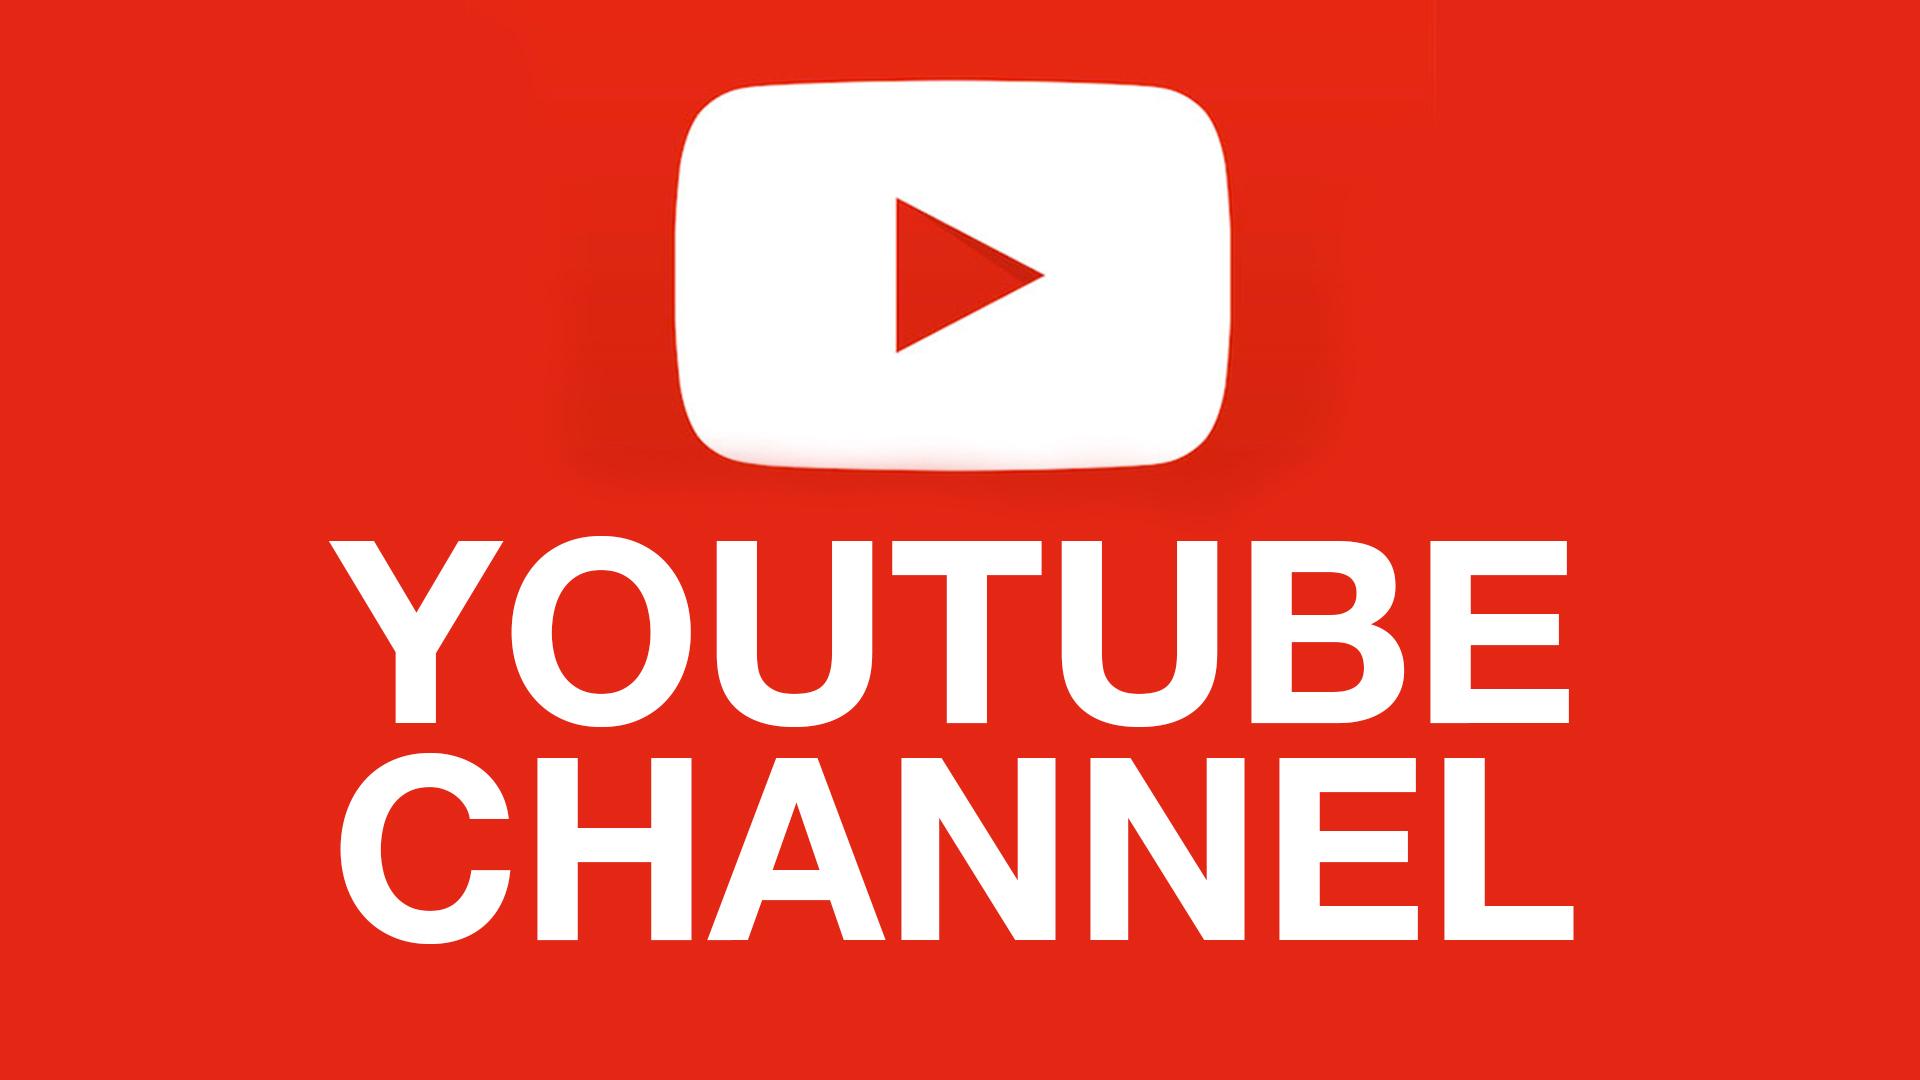 YouTube-Channel_Thumb.jpg